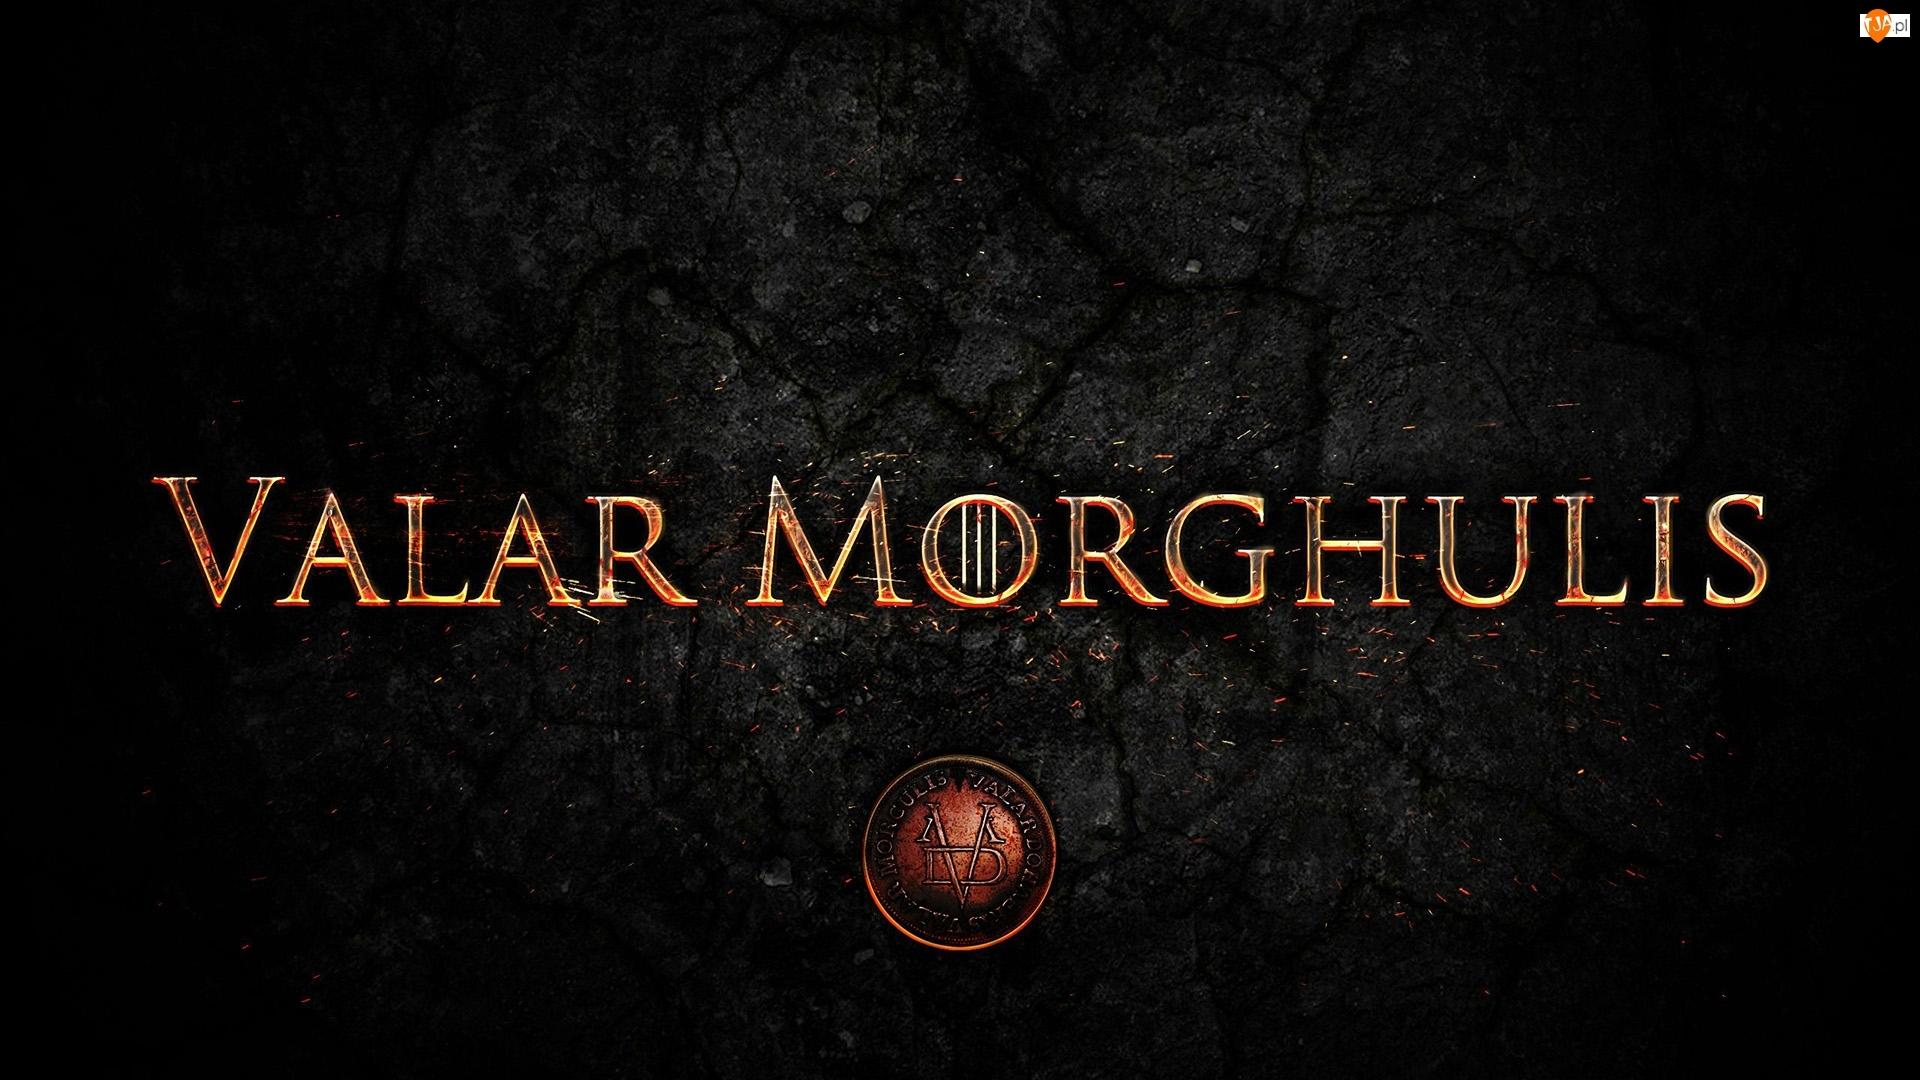 Gra o Tron, Tło, Valar Morghulis, Czarne